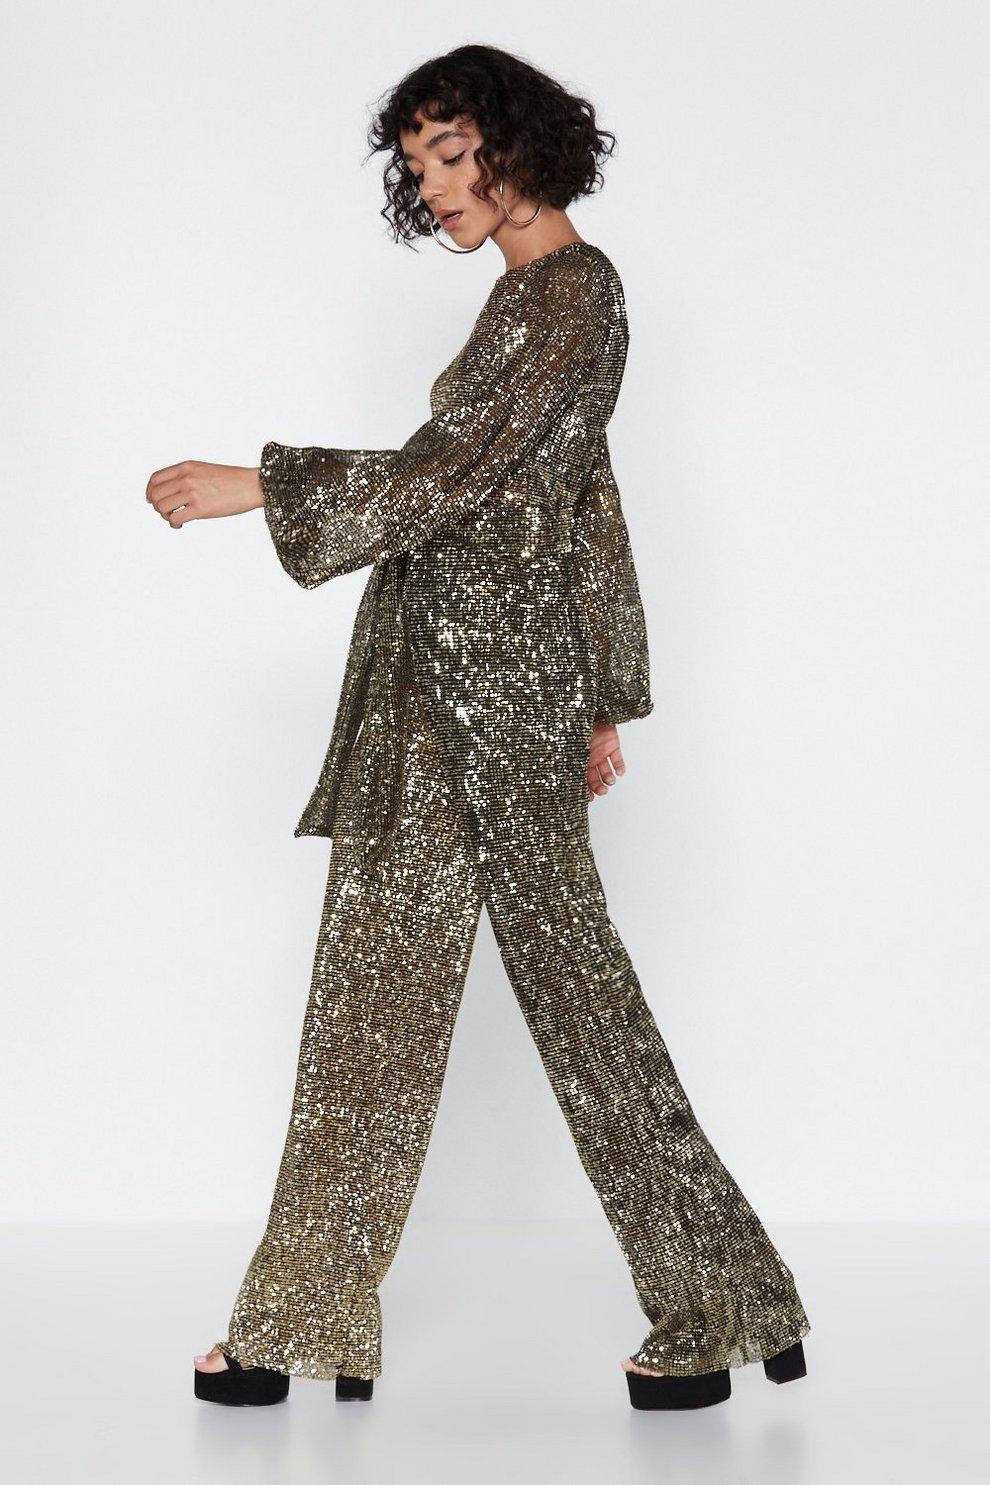 795e7b9b31e Disco with It Sequin Jumpsuit